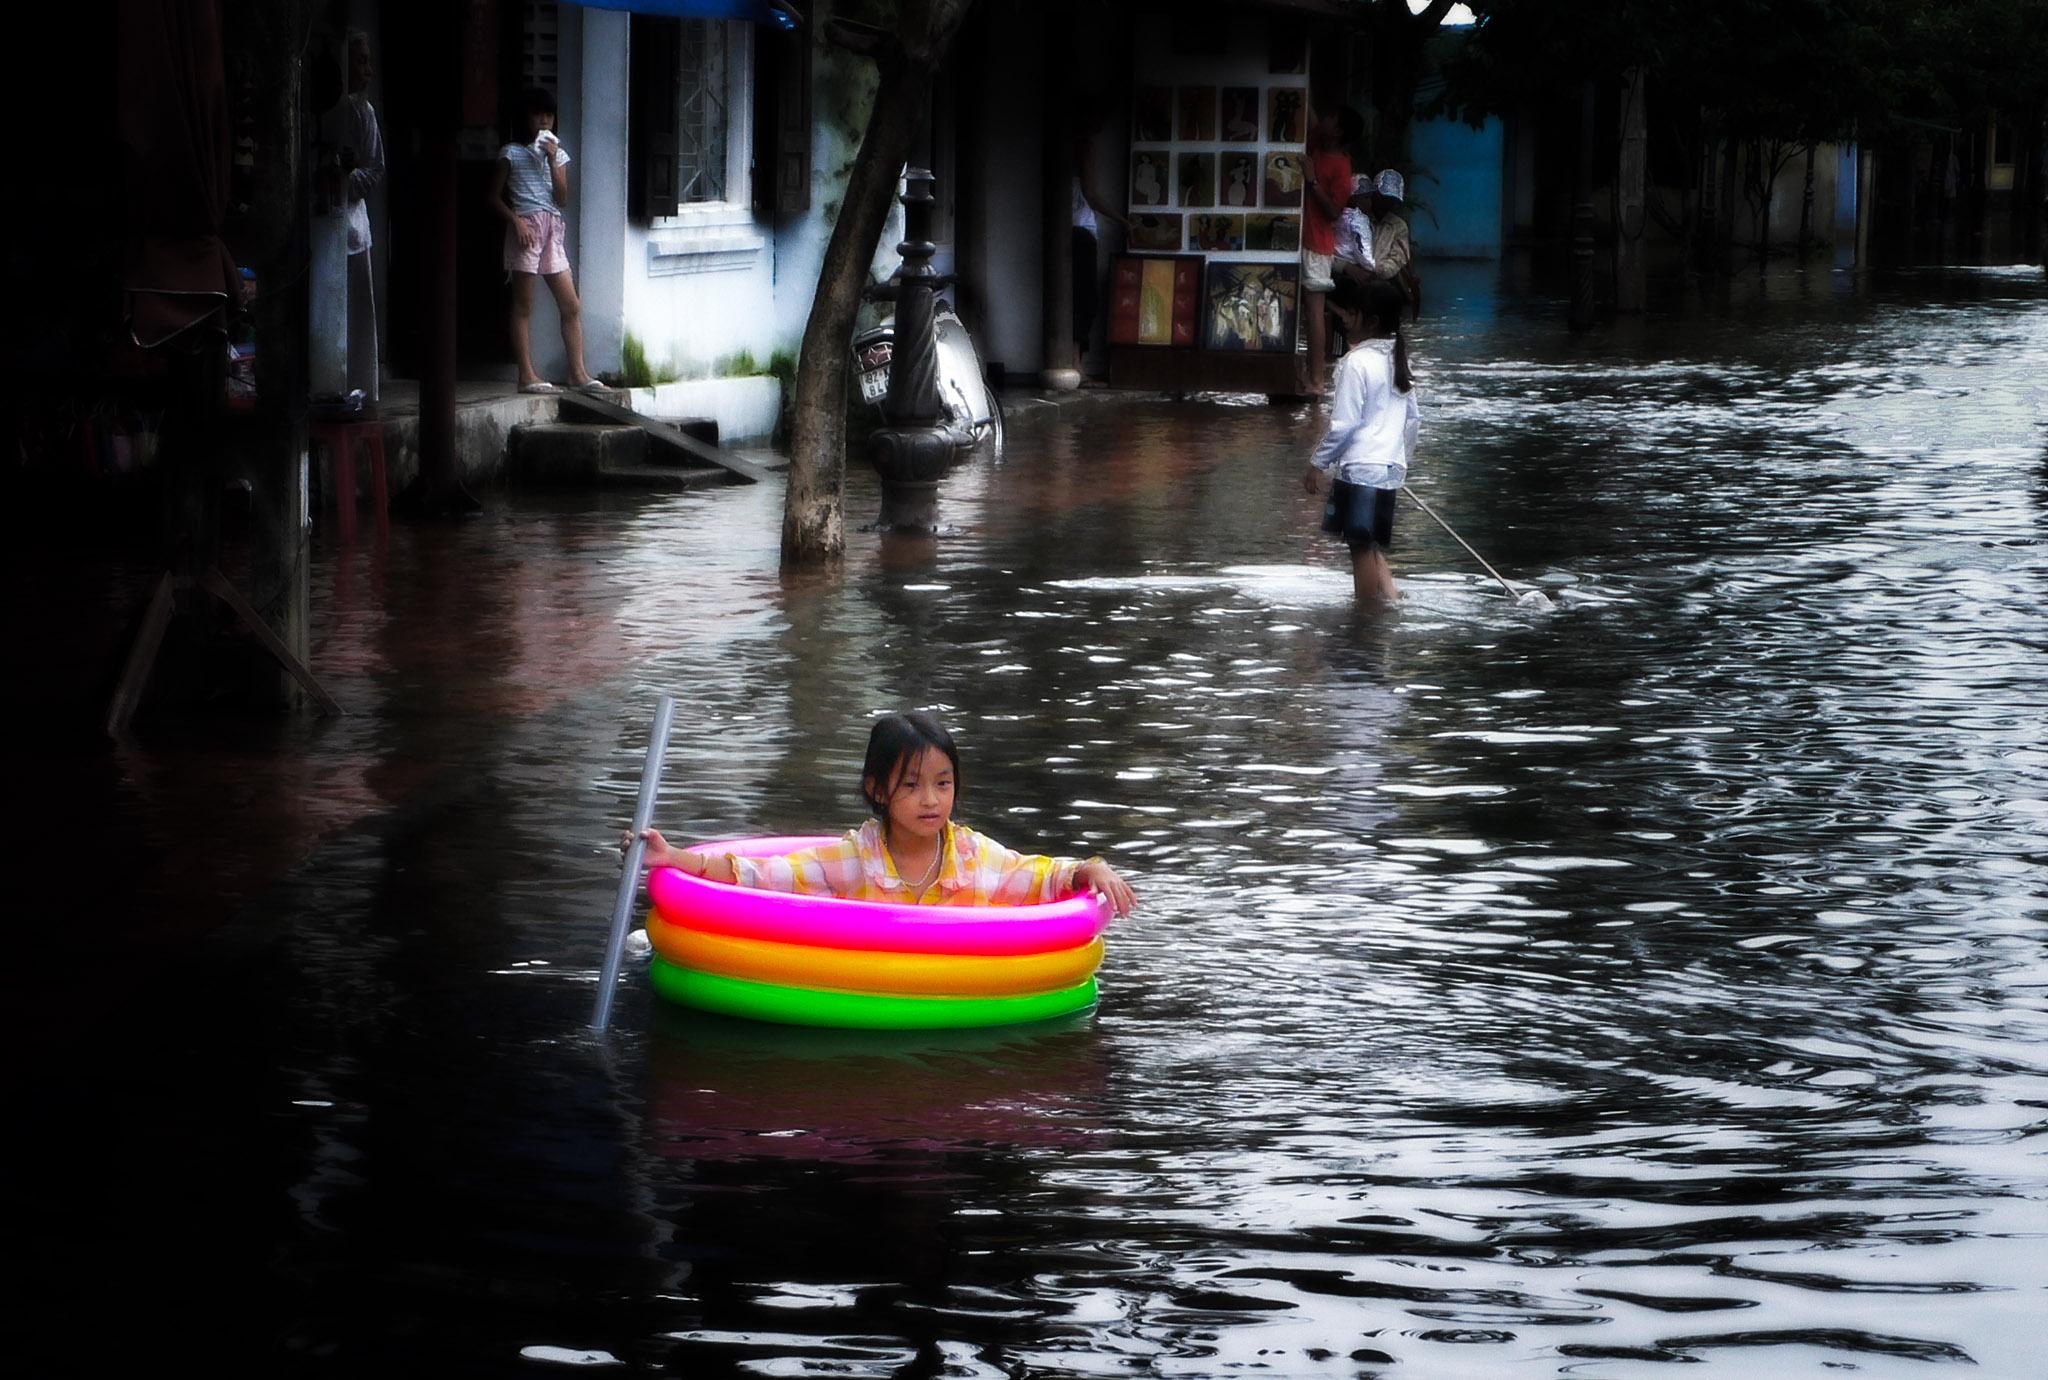 Hoi An, Vietnam during the floods of 2008